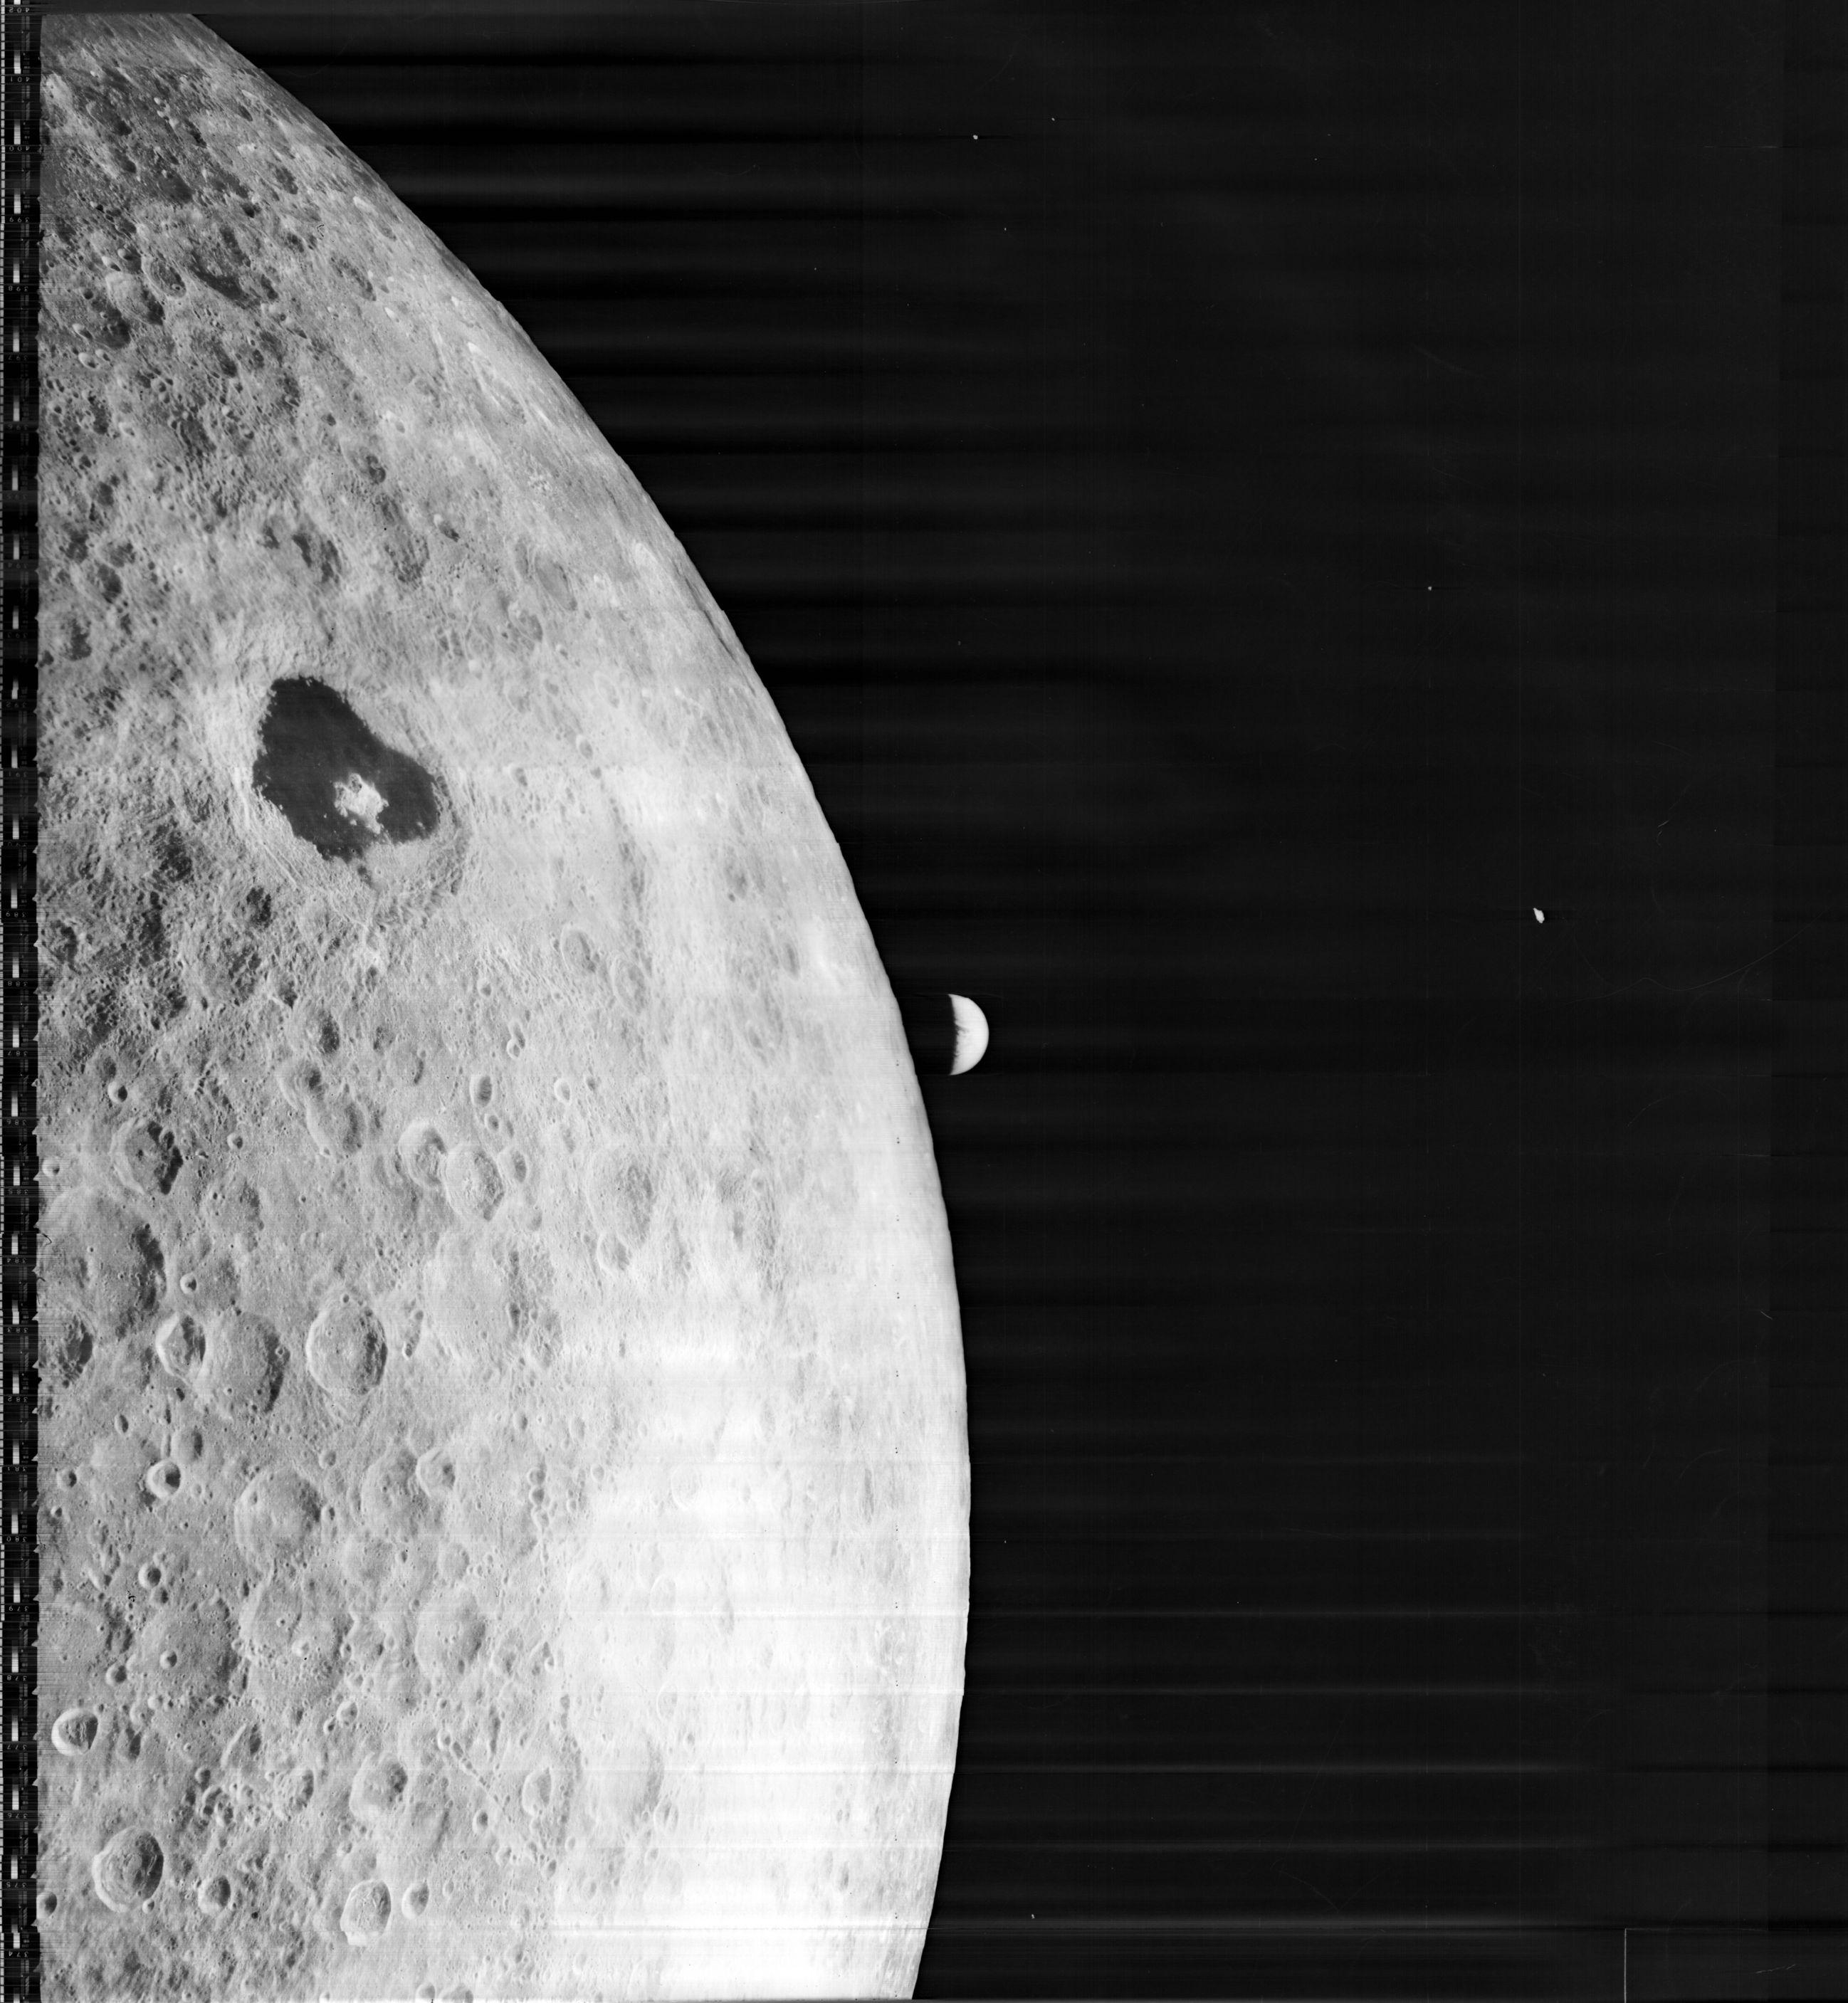 moon shots of earth and mars - photo #43